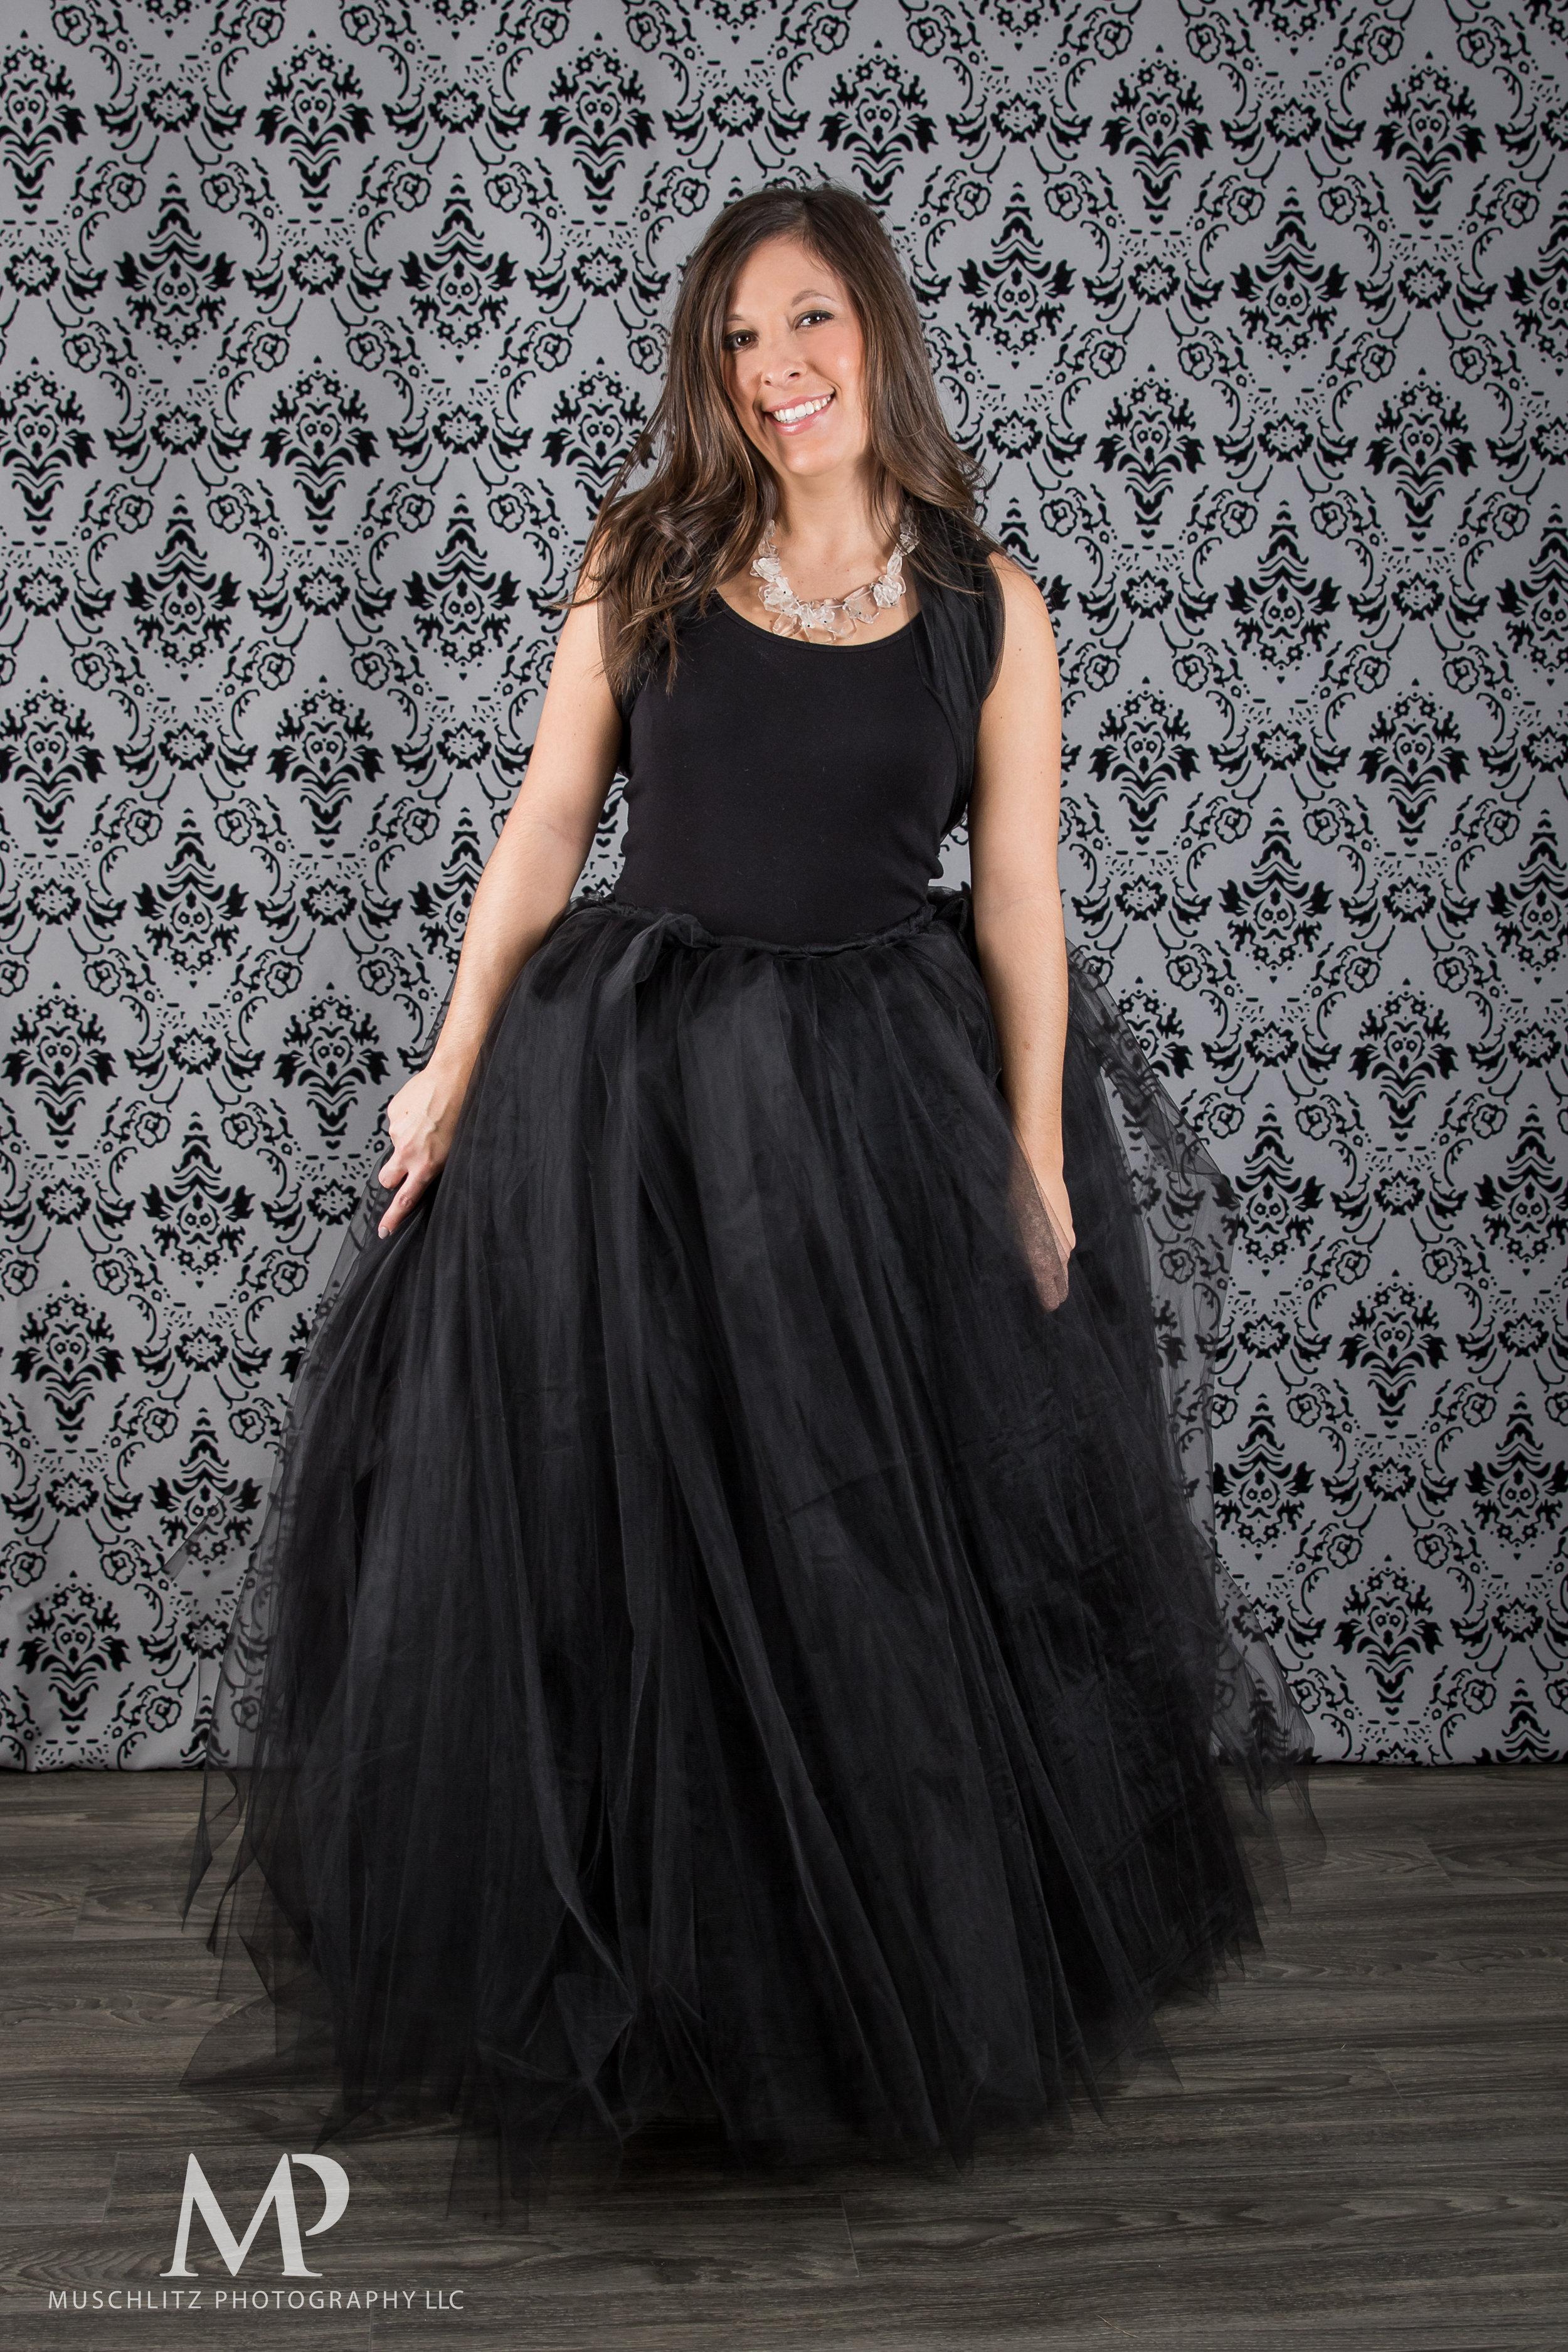 beauty-bridal-glam-the-dress-portraits-photographer-studio-columbus-ohio-gahanna-muschlitz-photography-008.JPG